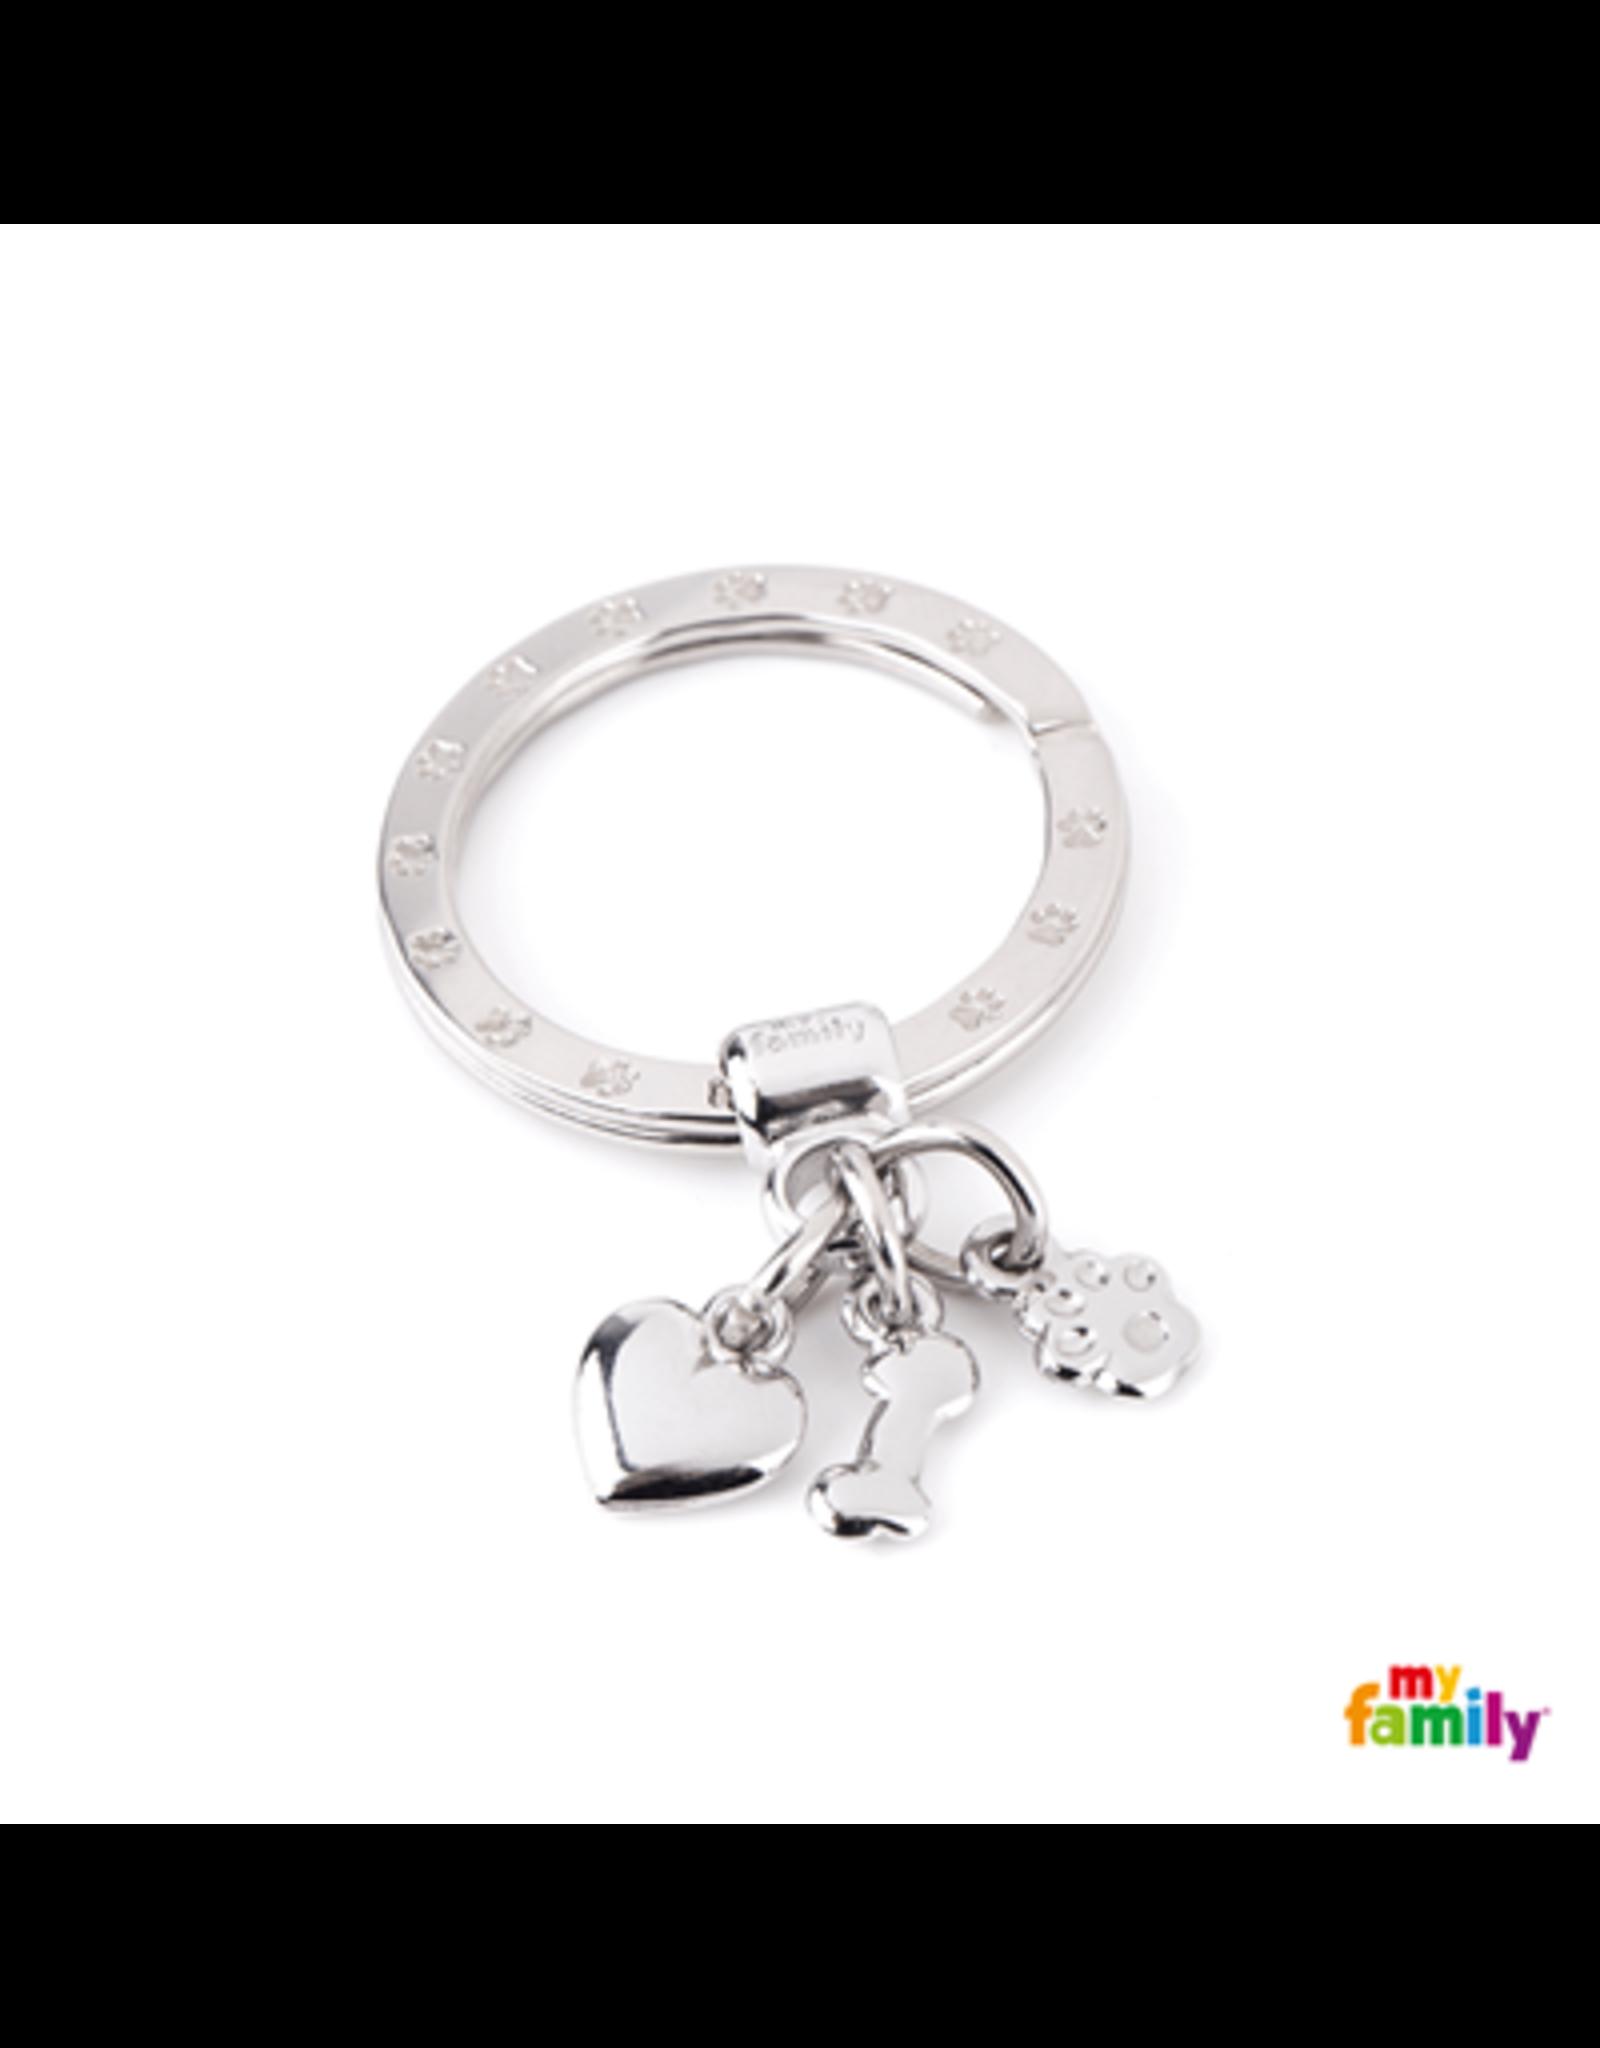 MyFamily Tag - Key Ring